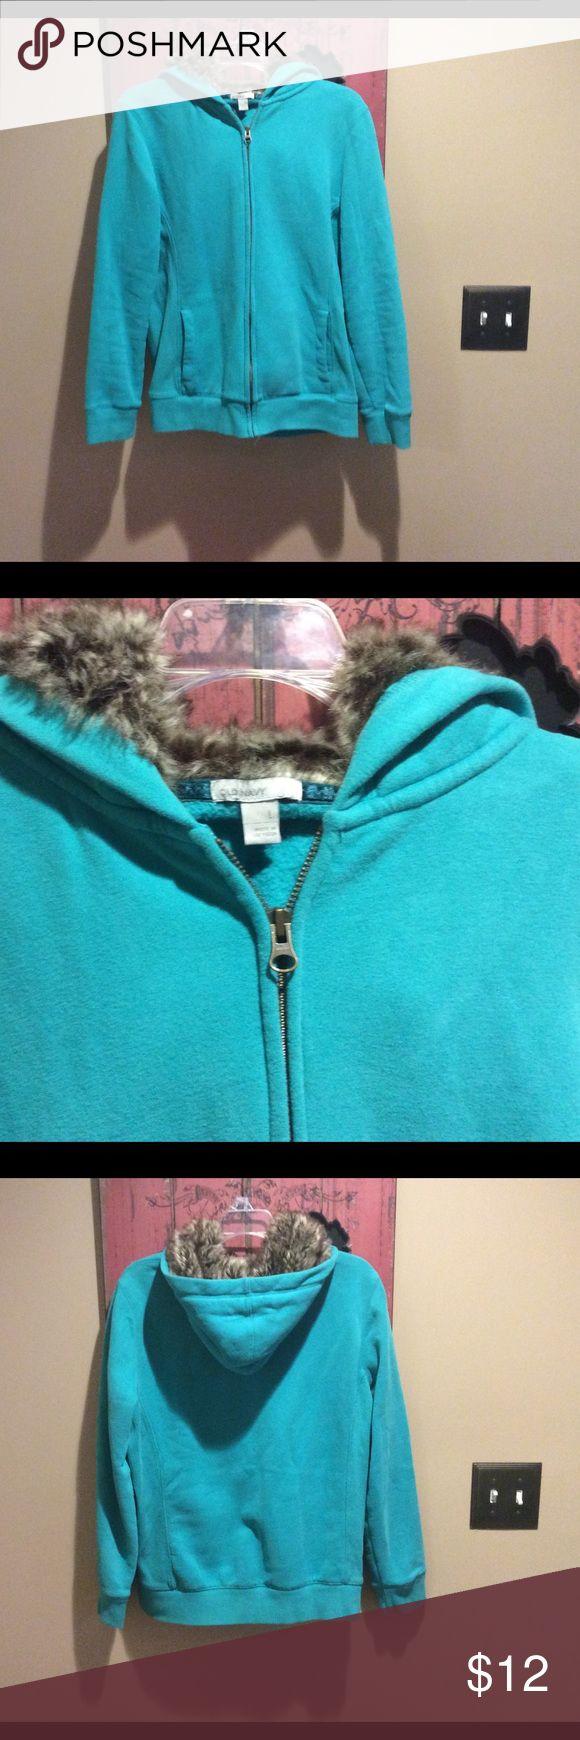 Old navy zip up hoodie Super cute Old Navy zip up hoodie with faux fur hood.  Size large.  💕 Old Navy Tops Sweatshirts & Hoodies